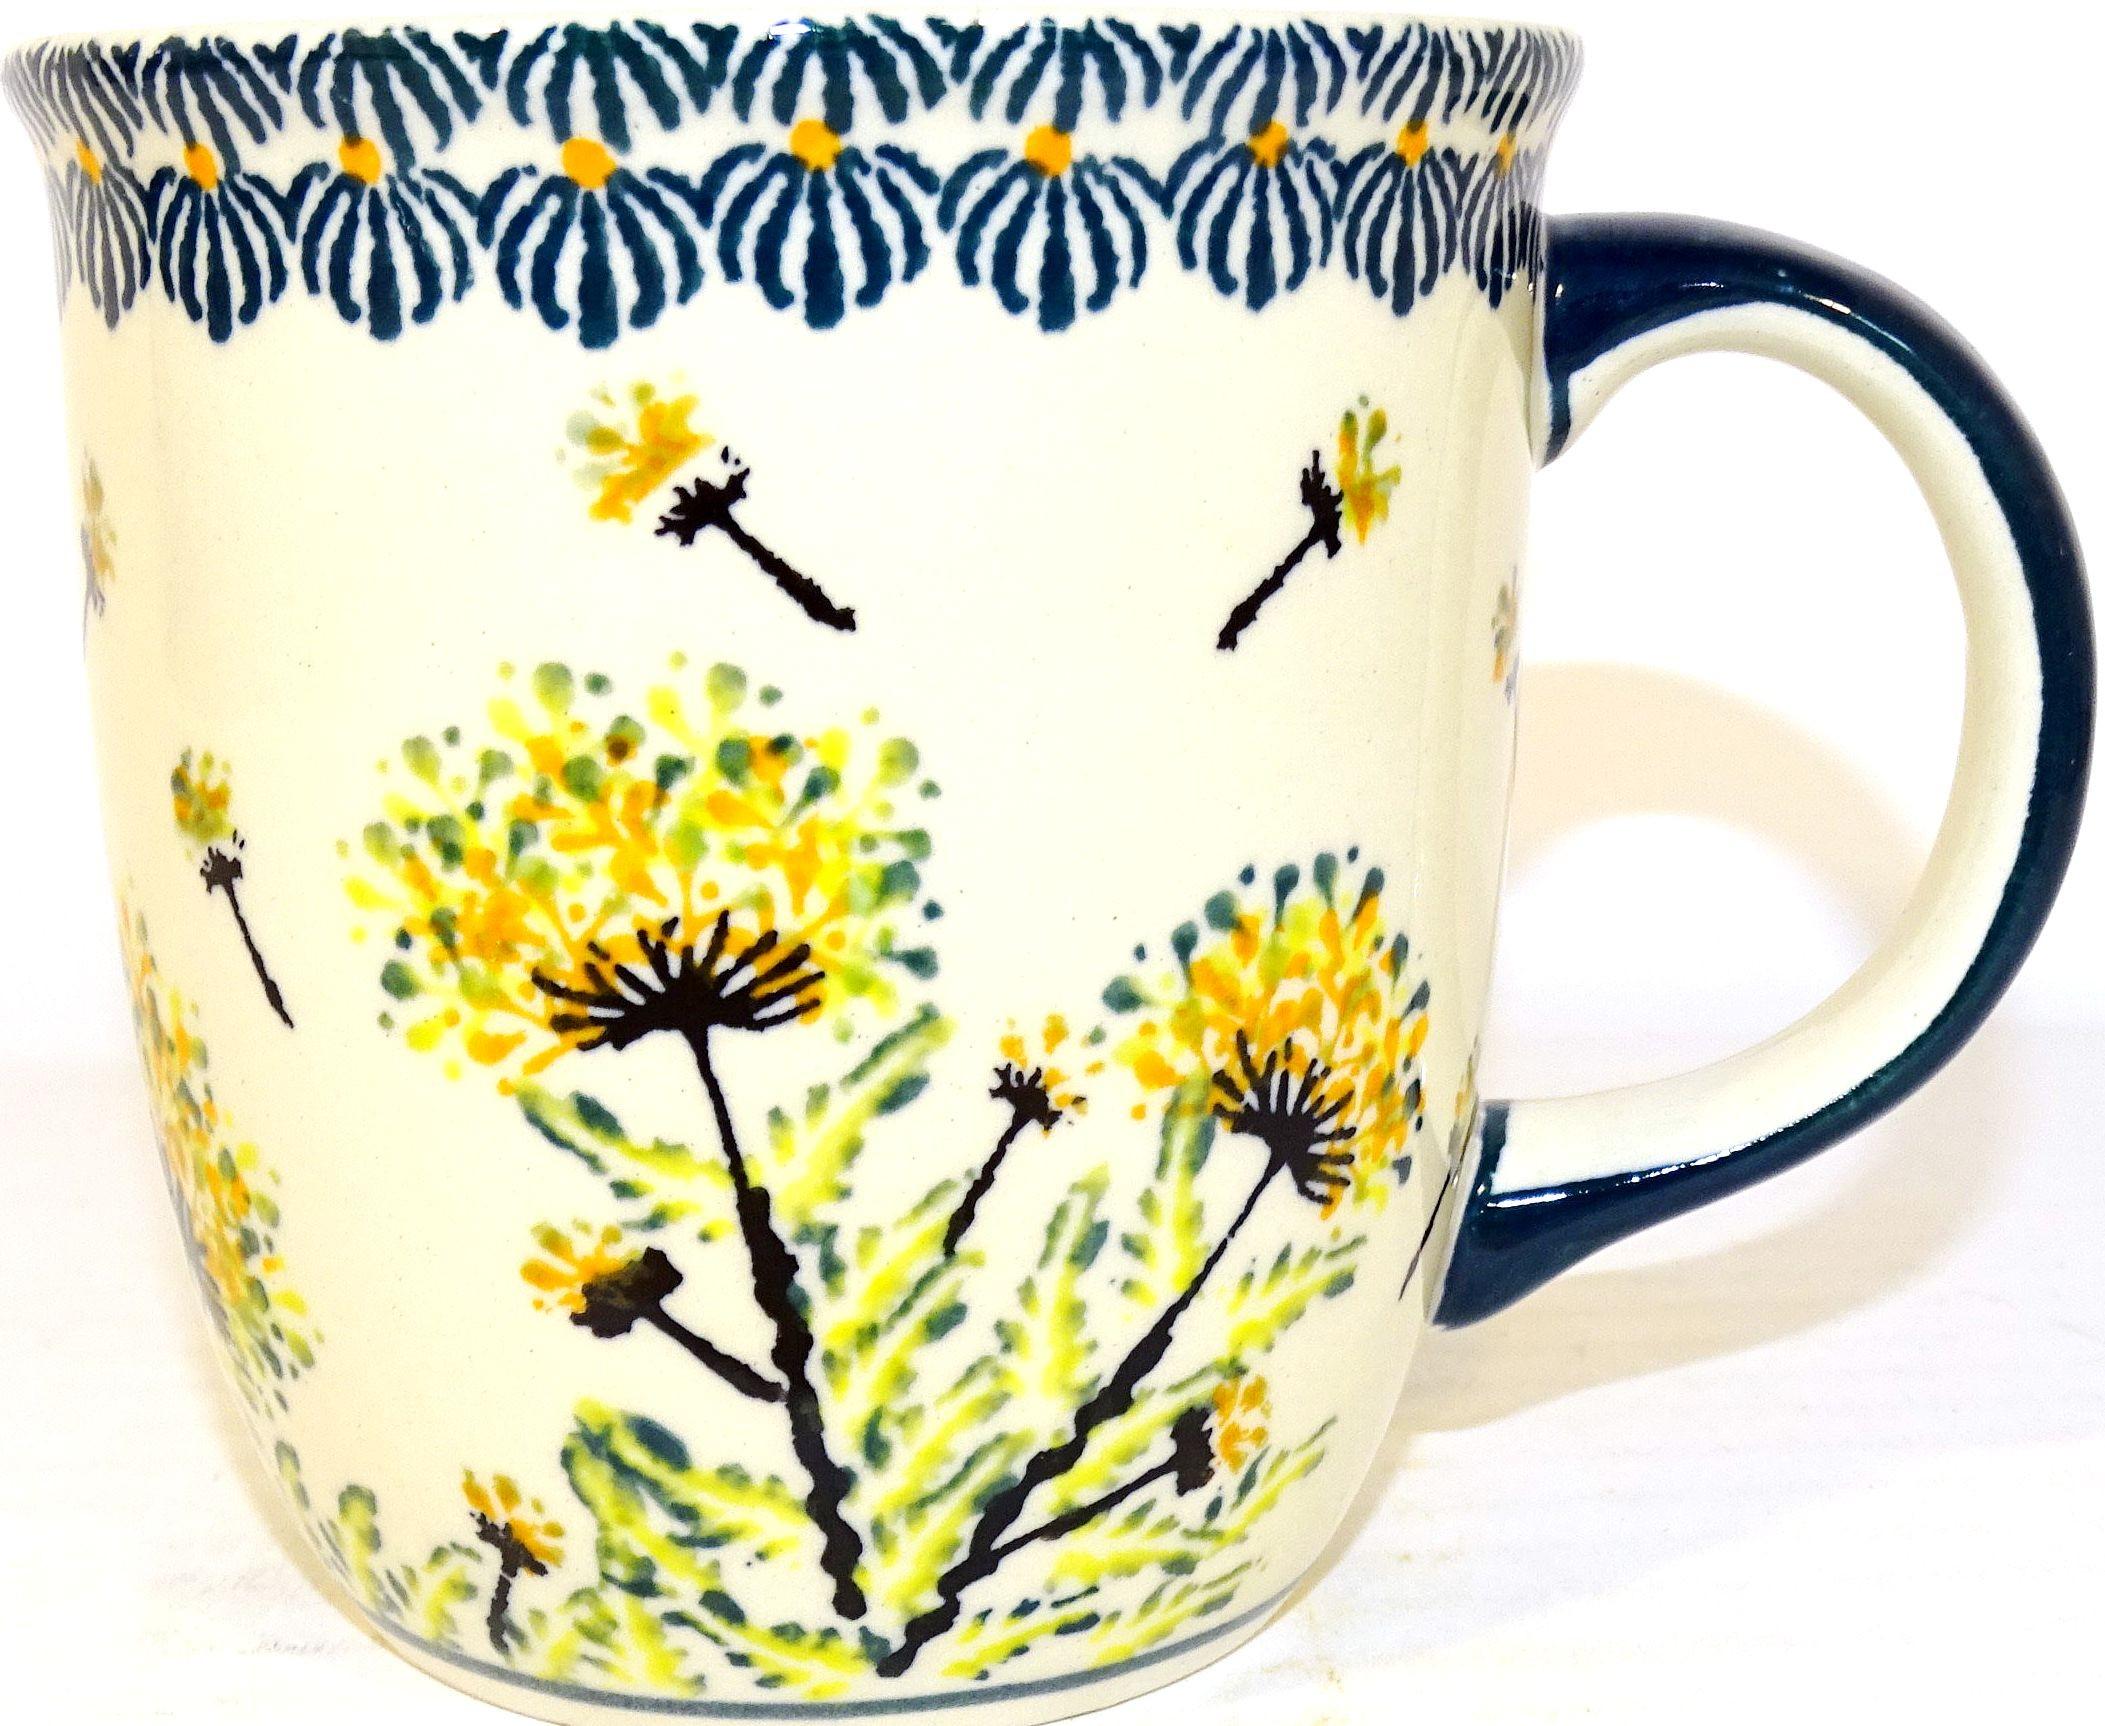 Pottery Avenue 12-oz Mug | ARTISAN